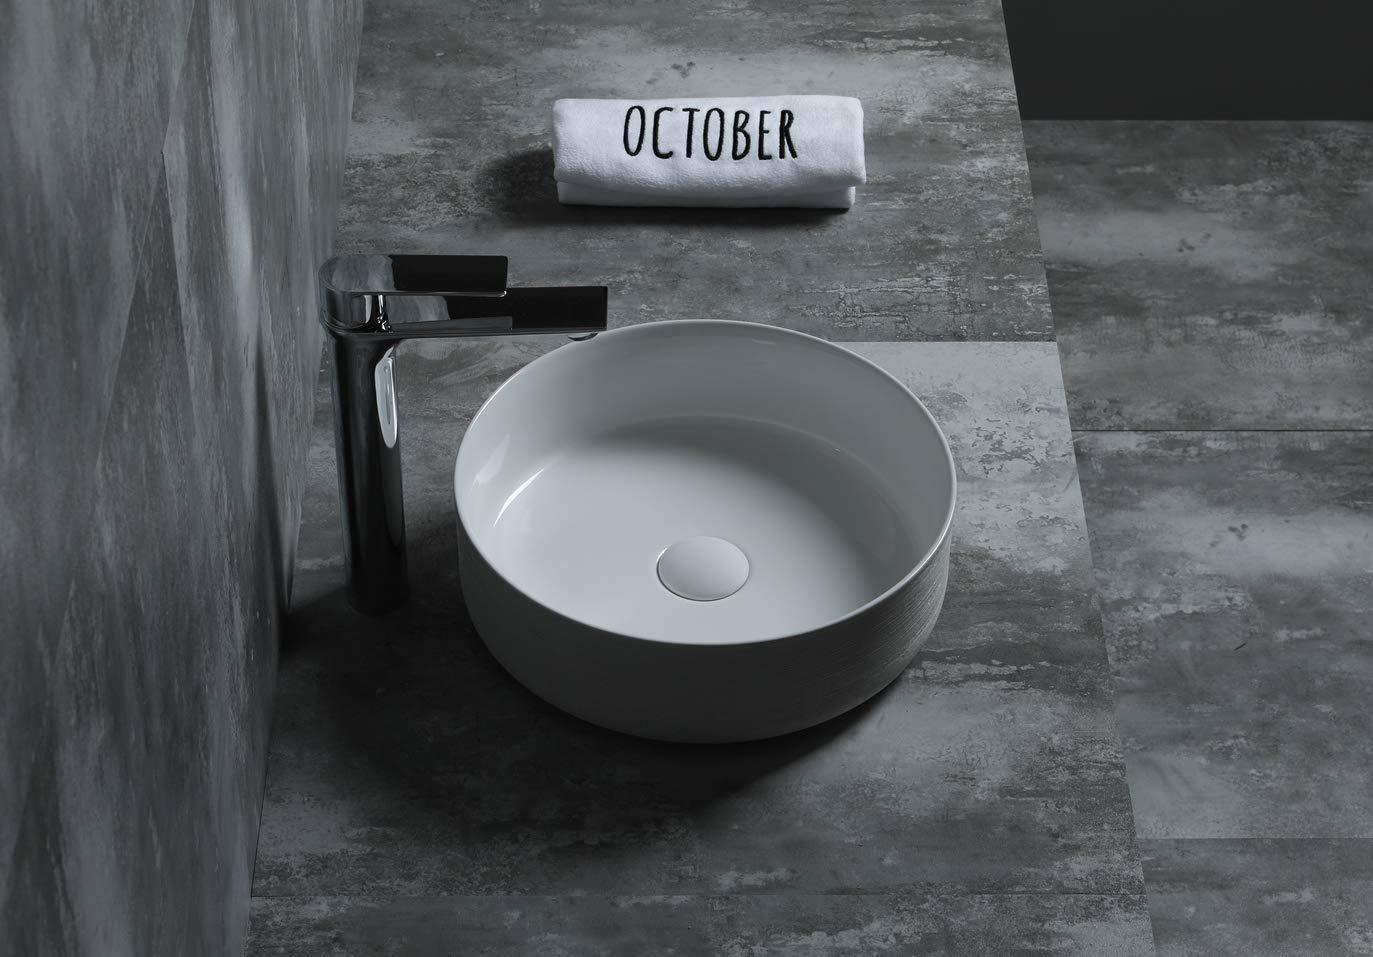 Forme Rond lavabo SFino-Cilin Art Beige Vasque /à Poser Salle de Bain en c/éramique Starbath